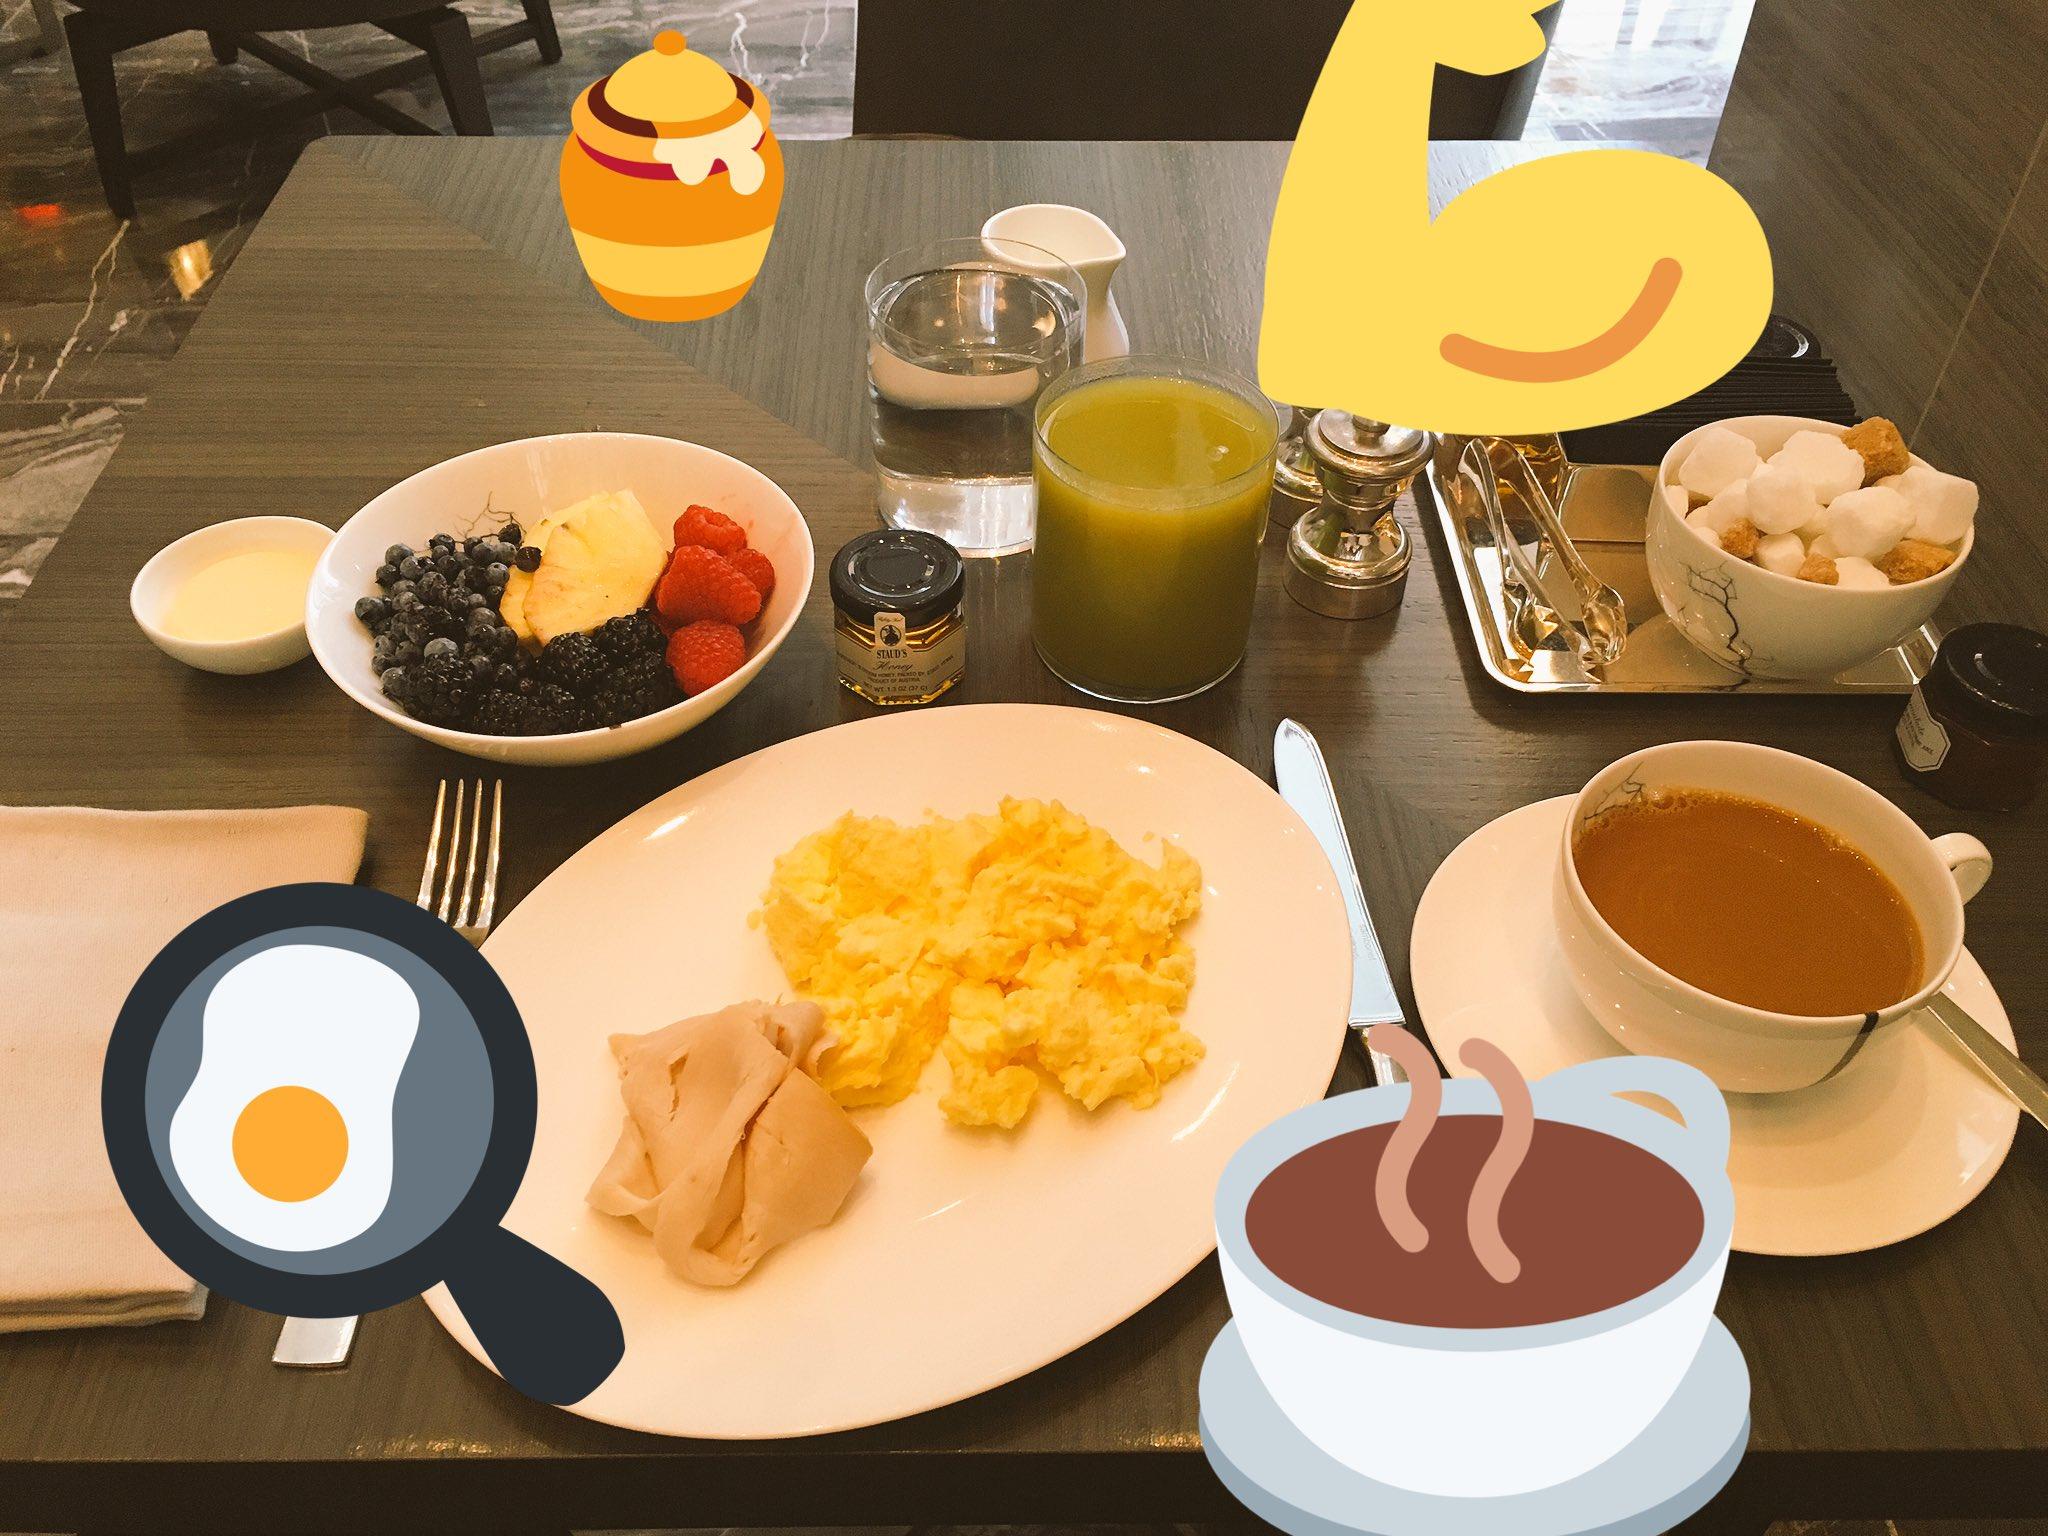 Perfect breakfast to start the day @ParkHyattNY !!! #parkhyattnewyork https://t.co/w5CE4ZeWqE